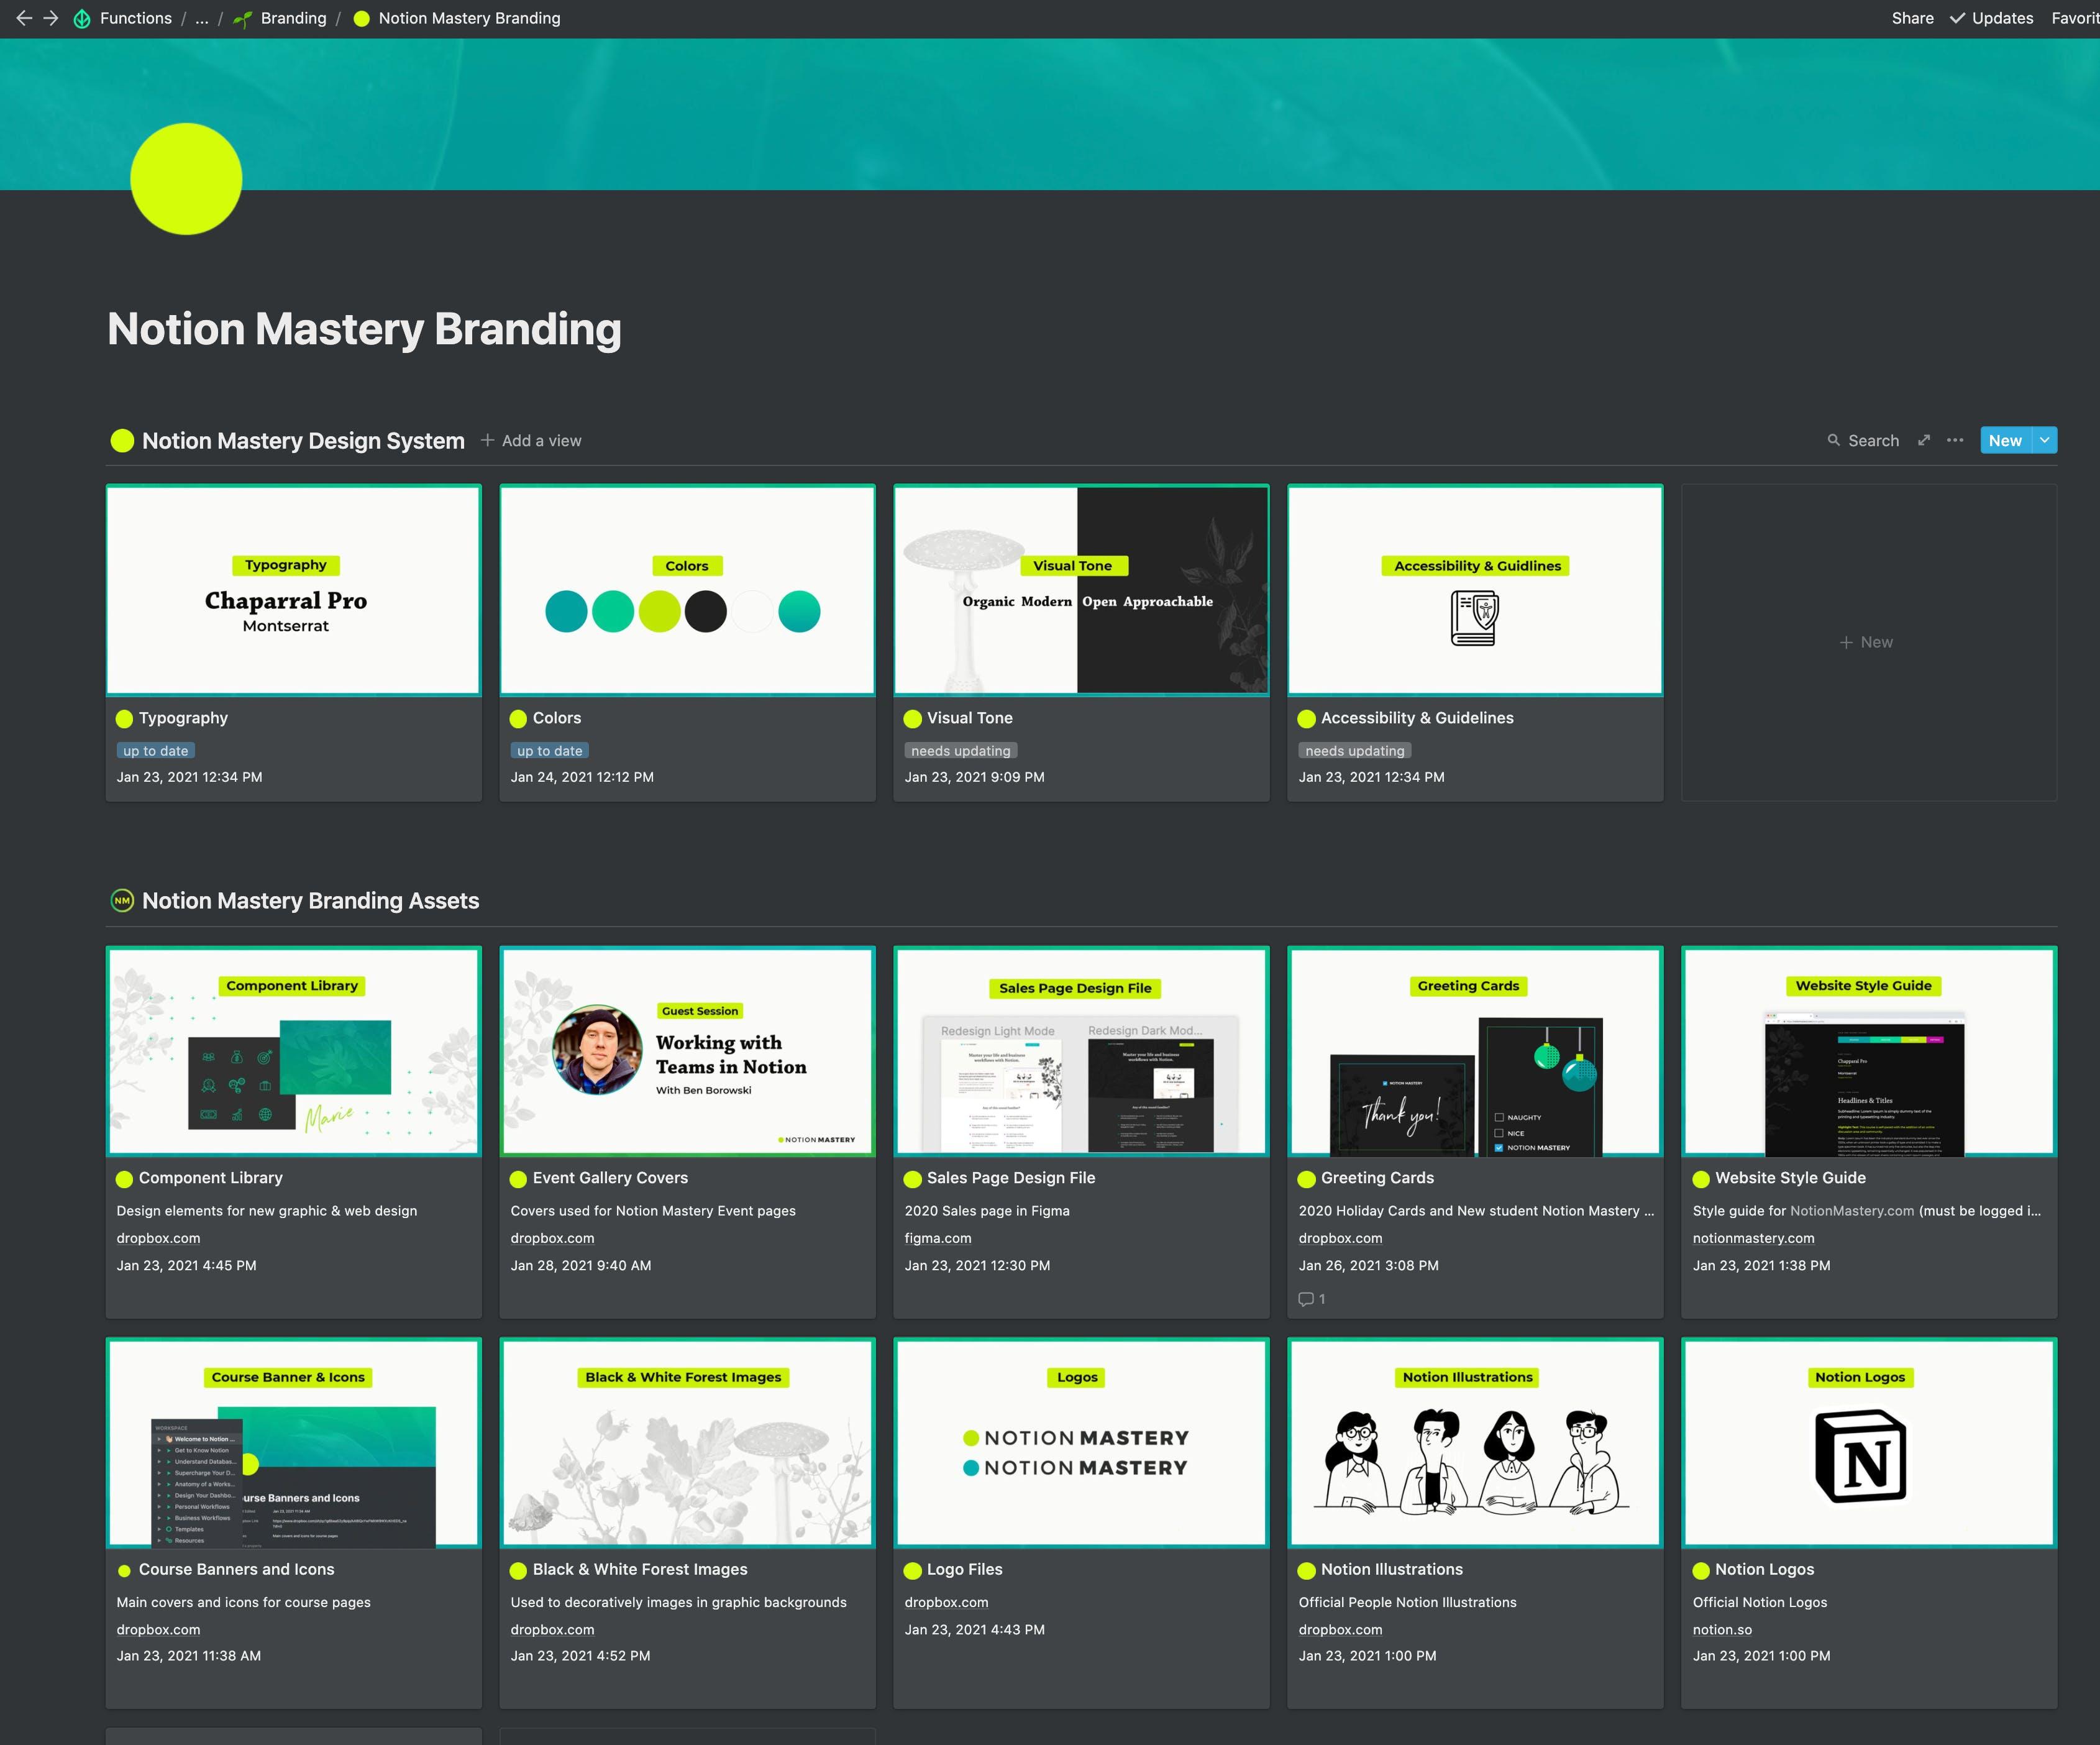 Notion Mastery Branding